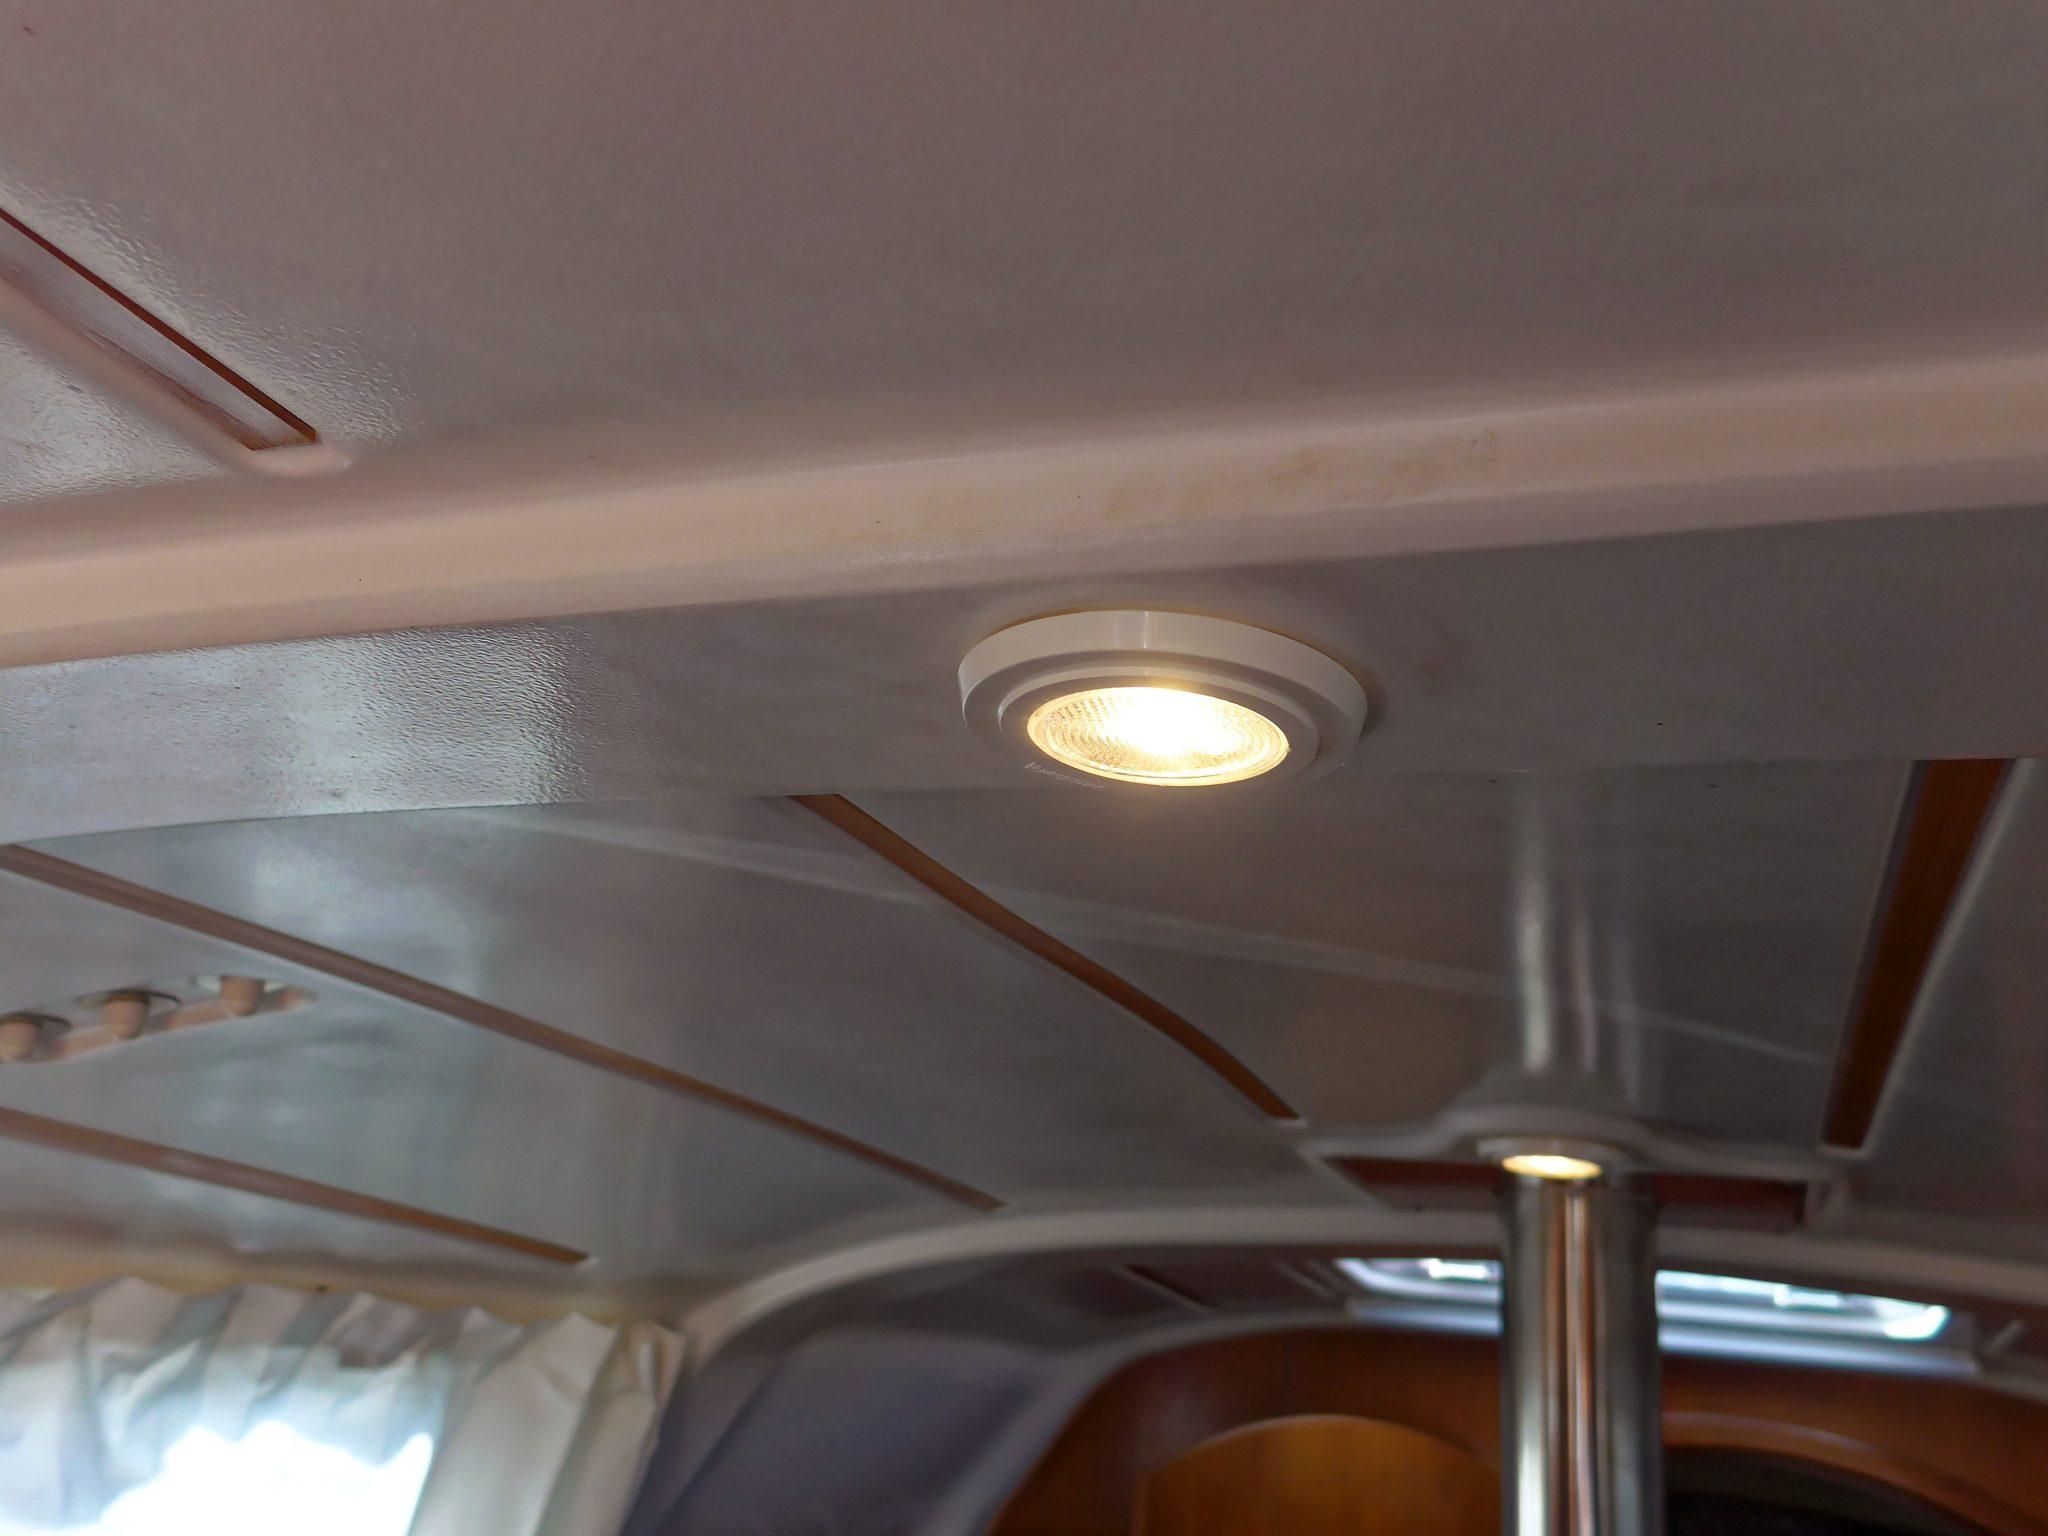 Aqua Signal light with CREE LED two lights